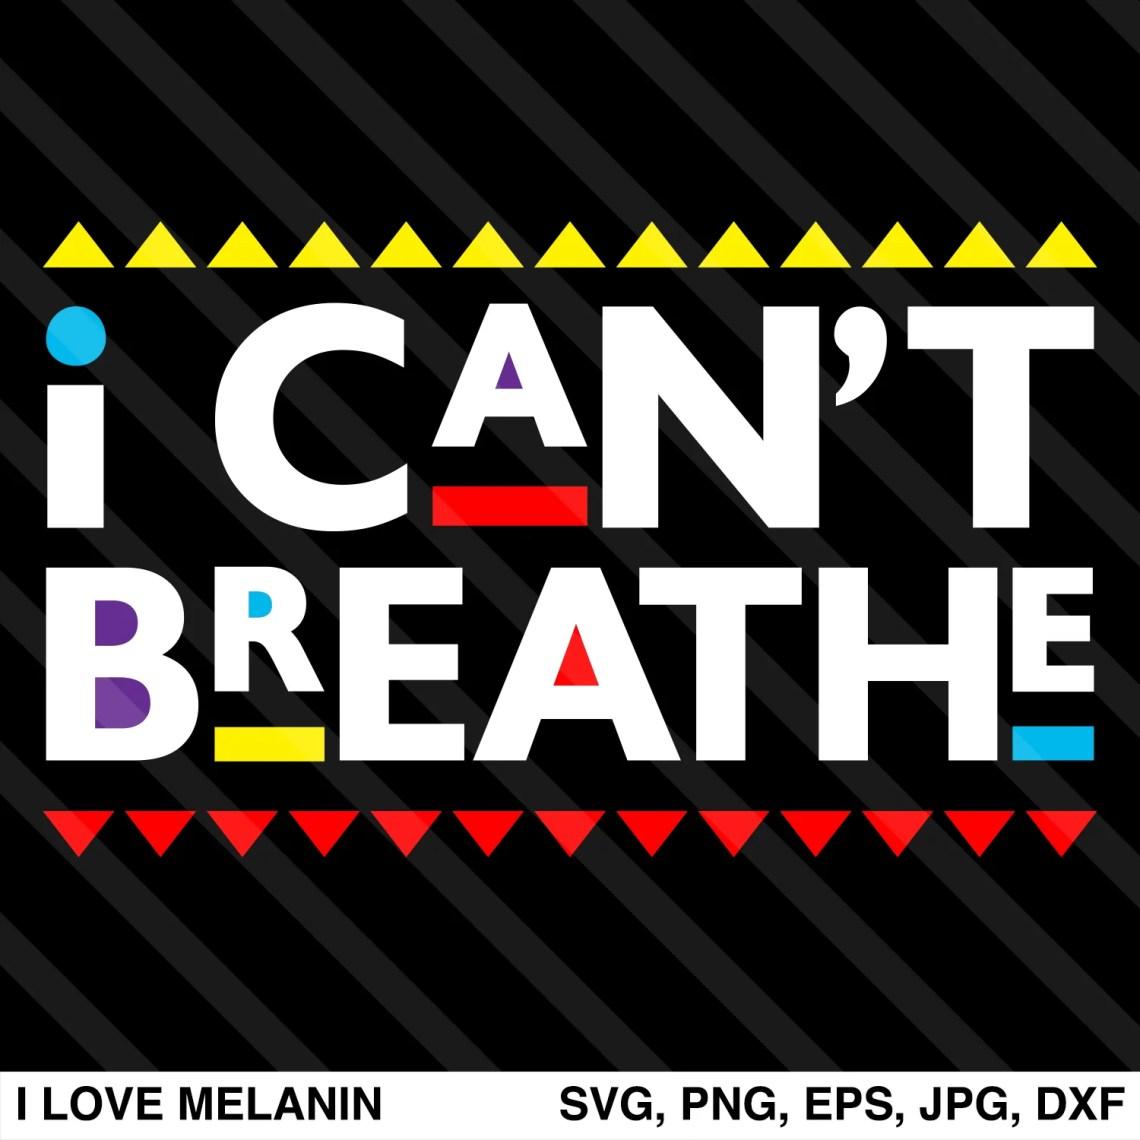 Download Breathe Svg Free Background Free SVG files ...